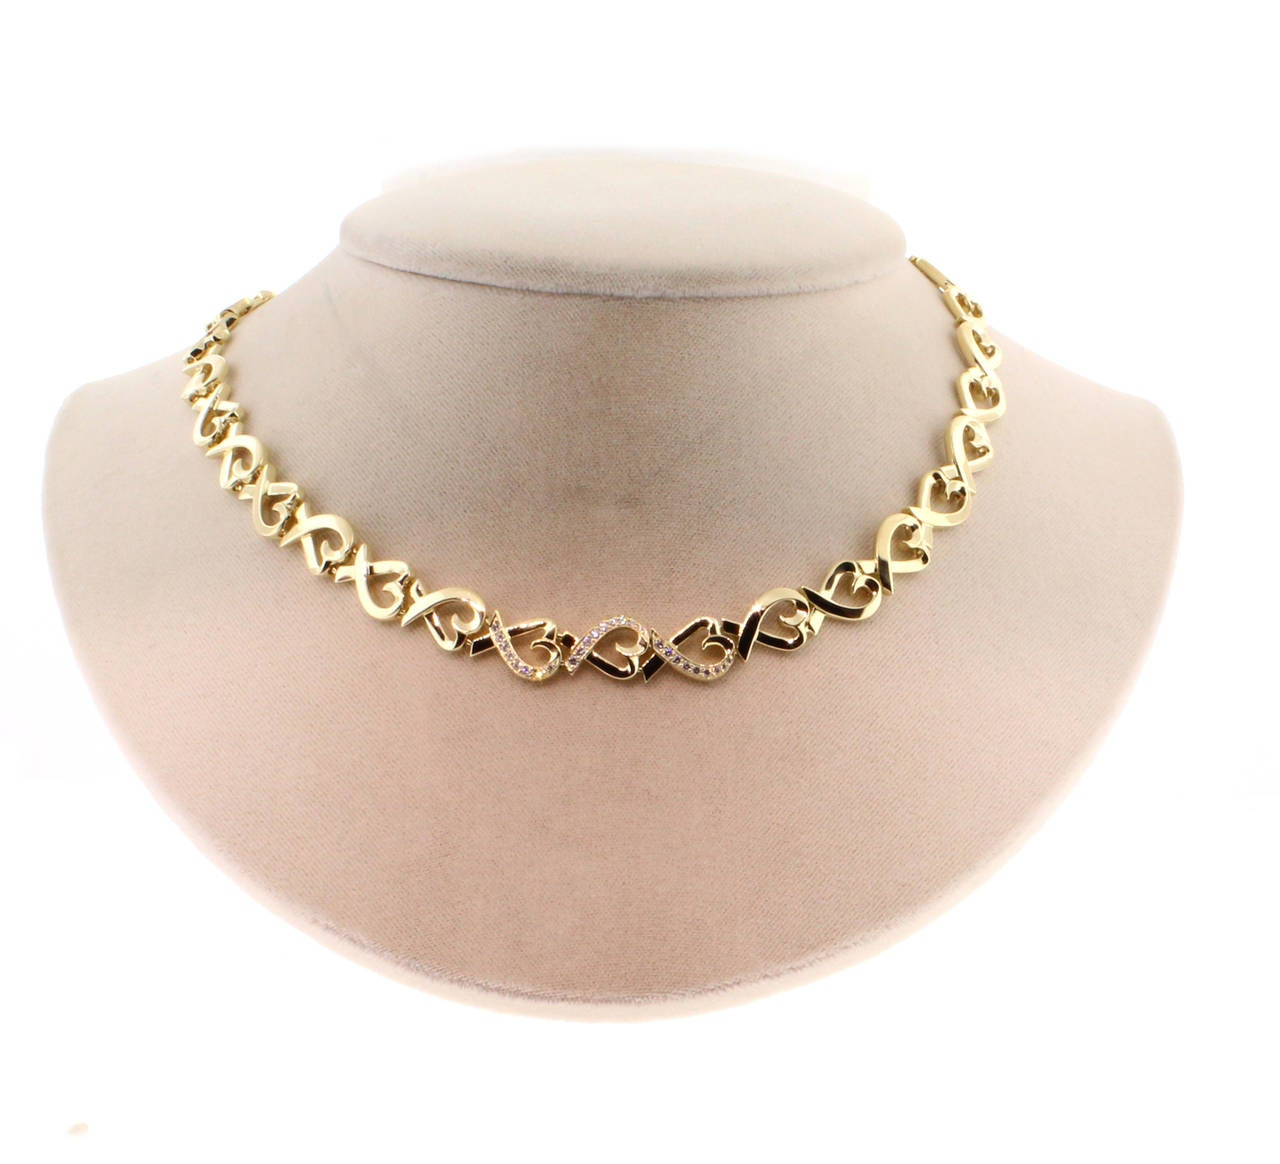 Tiffany & Co. Paloma Picasso Diamond Gold Loving Heart Necklace 3